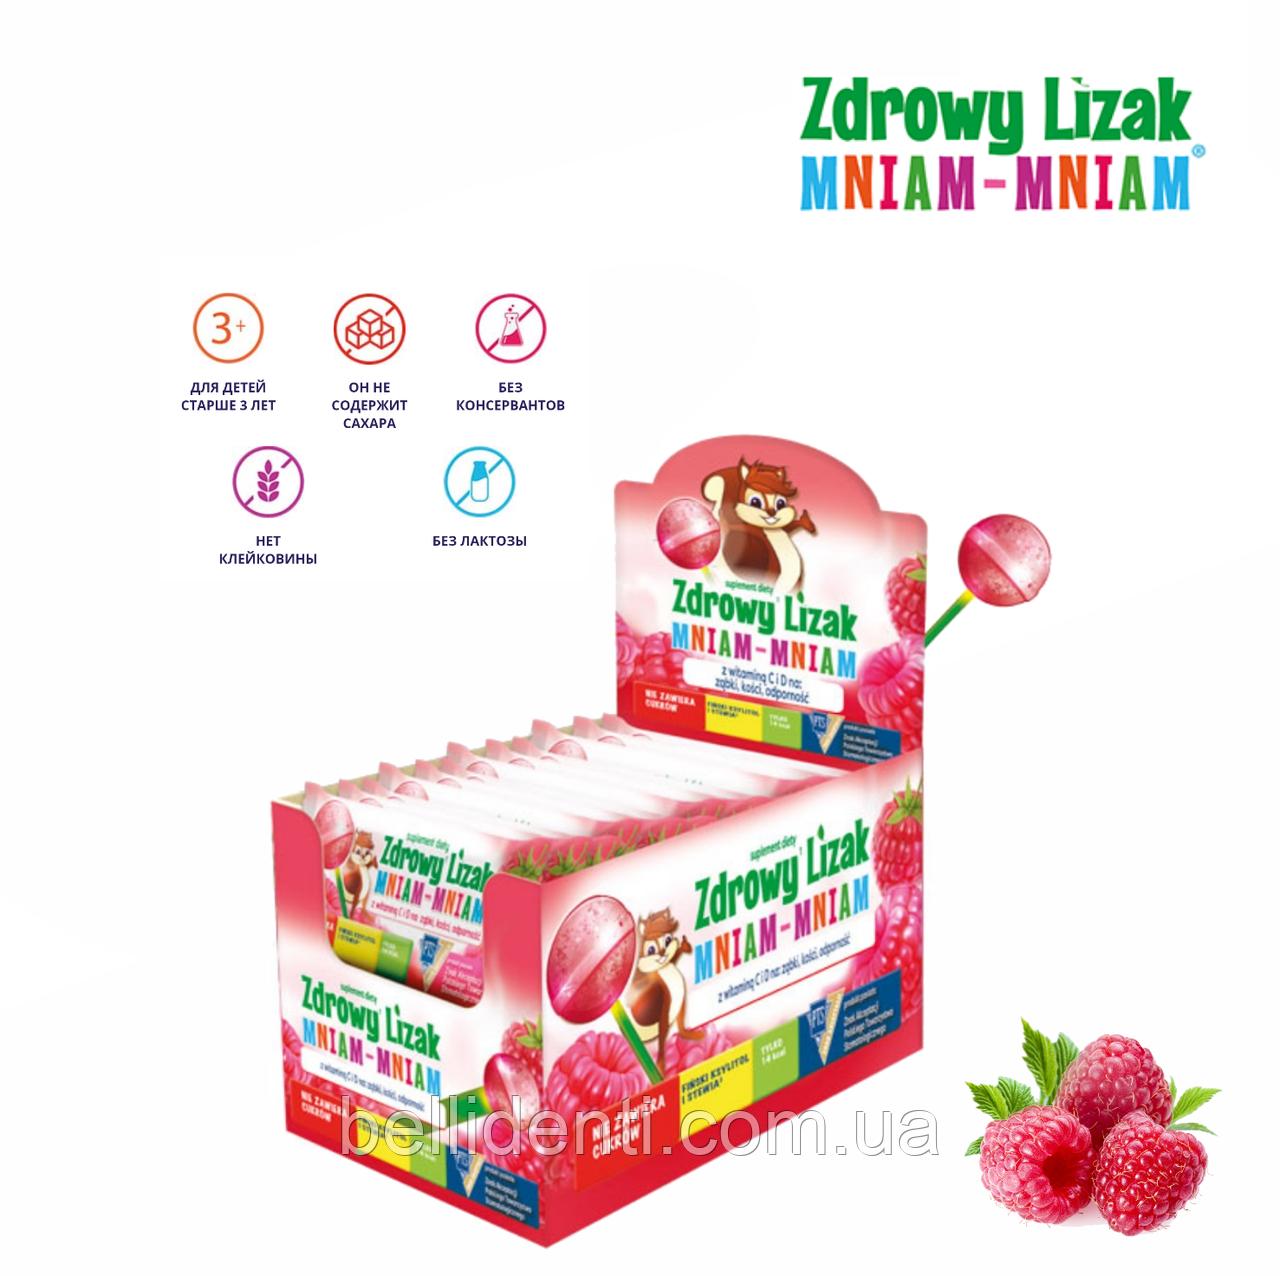 "Леденец Zdrowy Lizak ""Mniam-Mniam"" (малина), 40 шт"